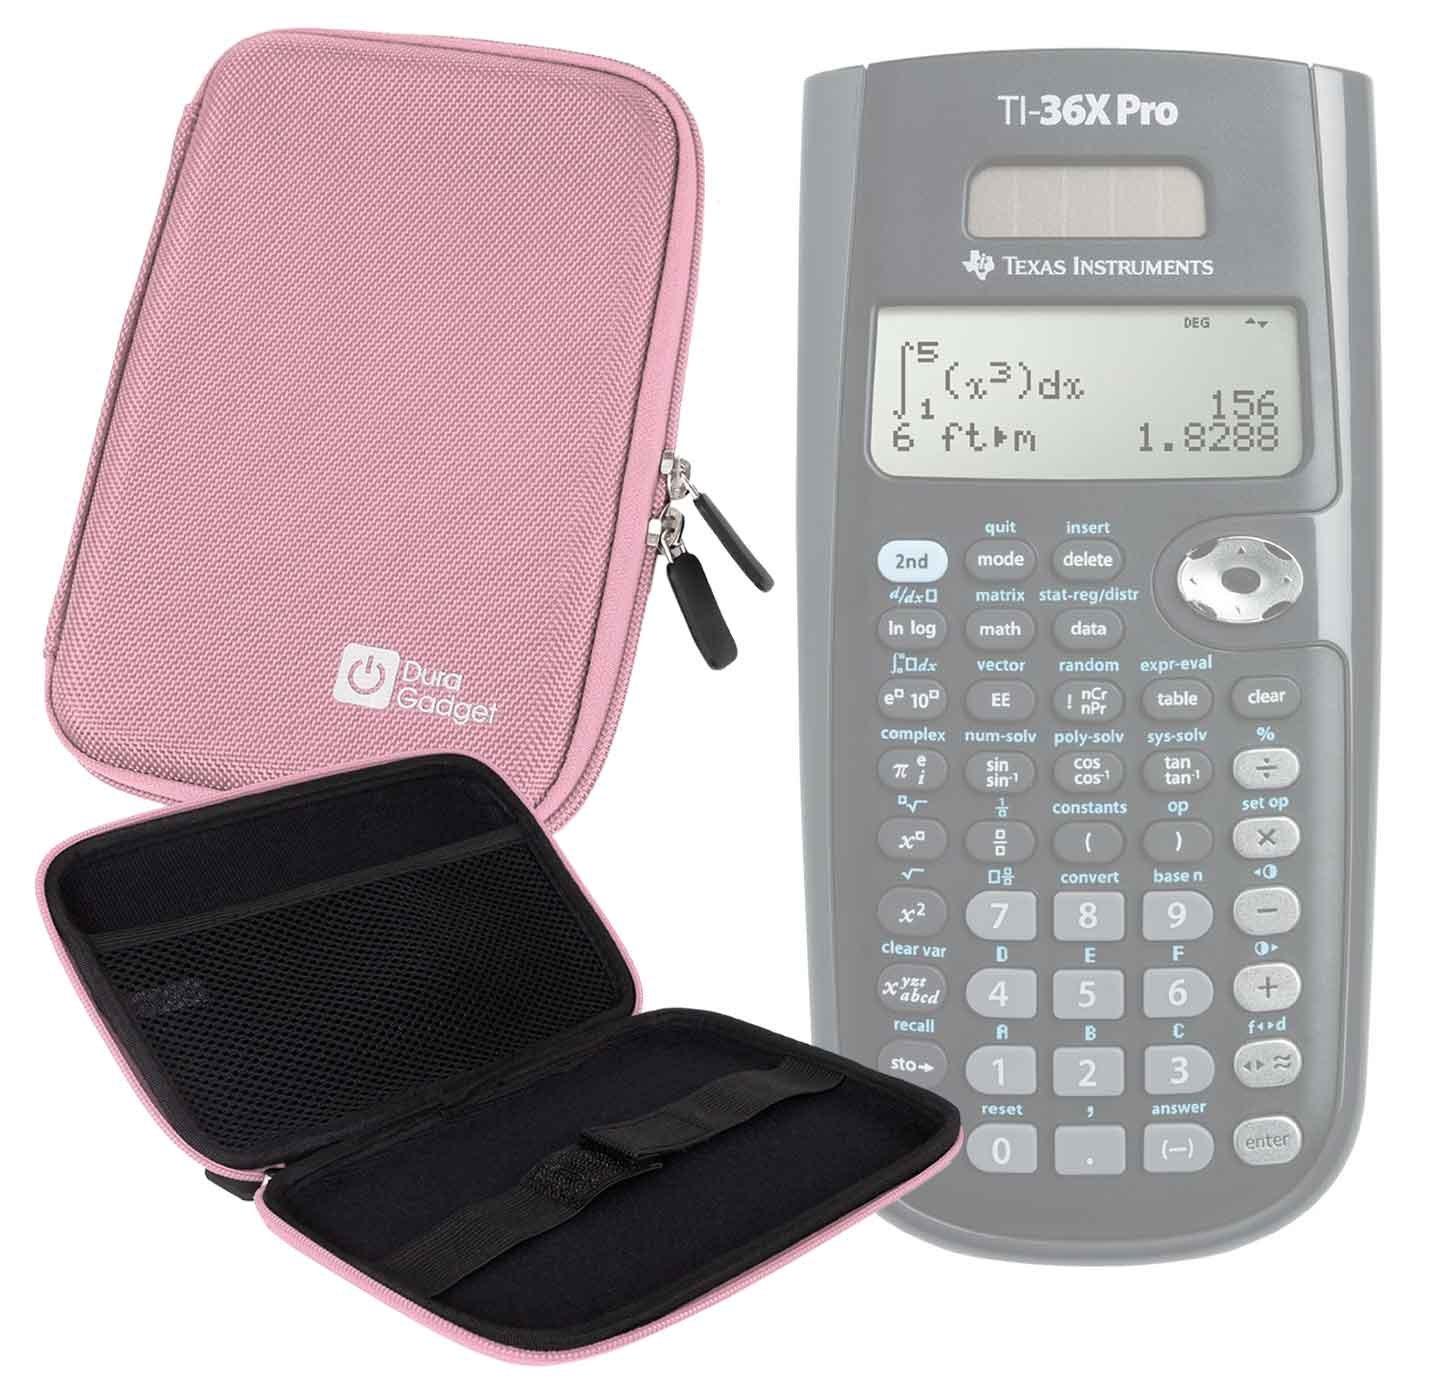 DURAGADGET Pink Hard EVA 'Shell' Case - for the Texas Instruments TI-36X Pro